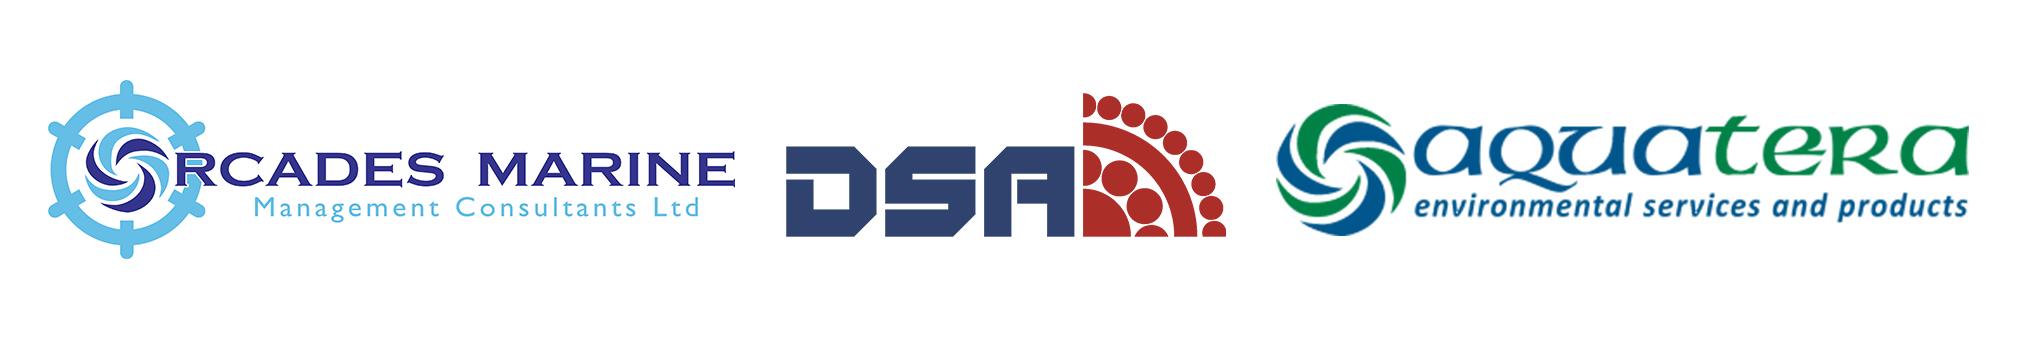 Image of the partner company logos